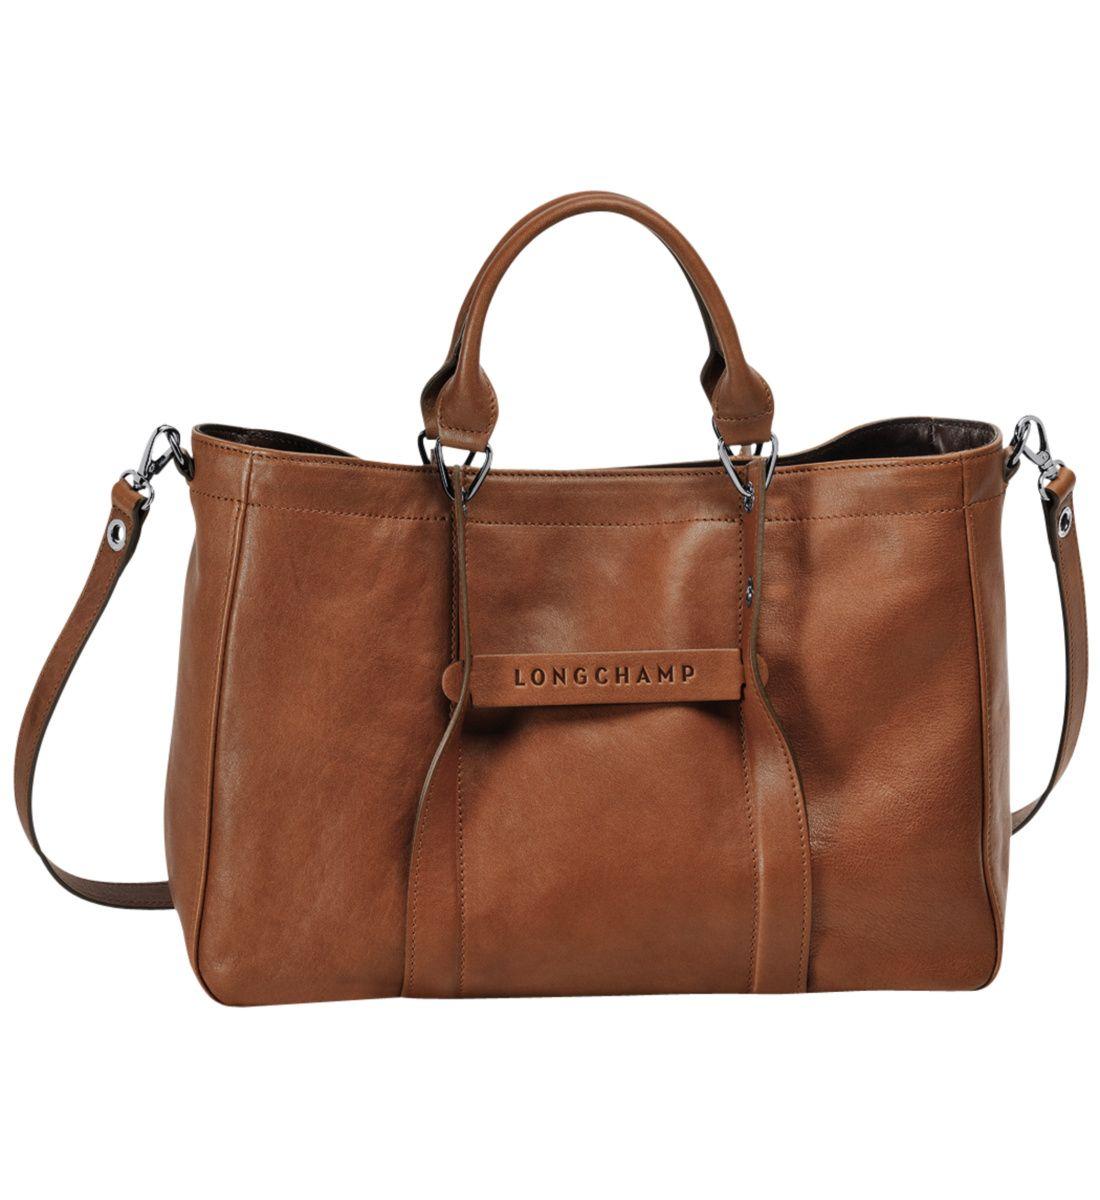 longchamp sac marron